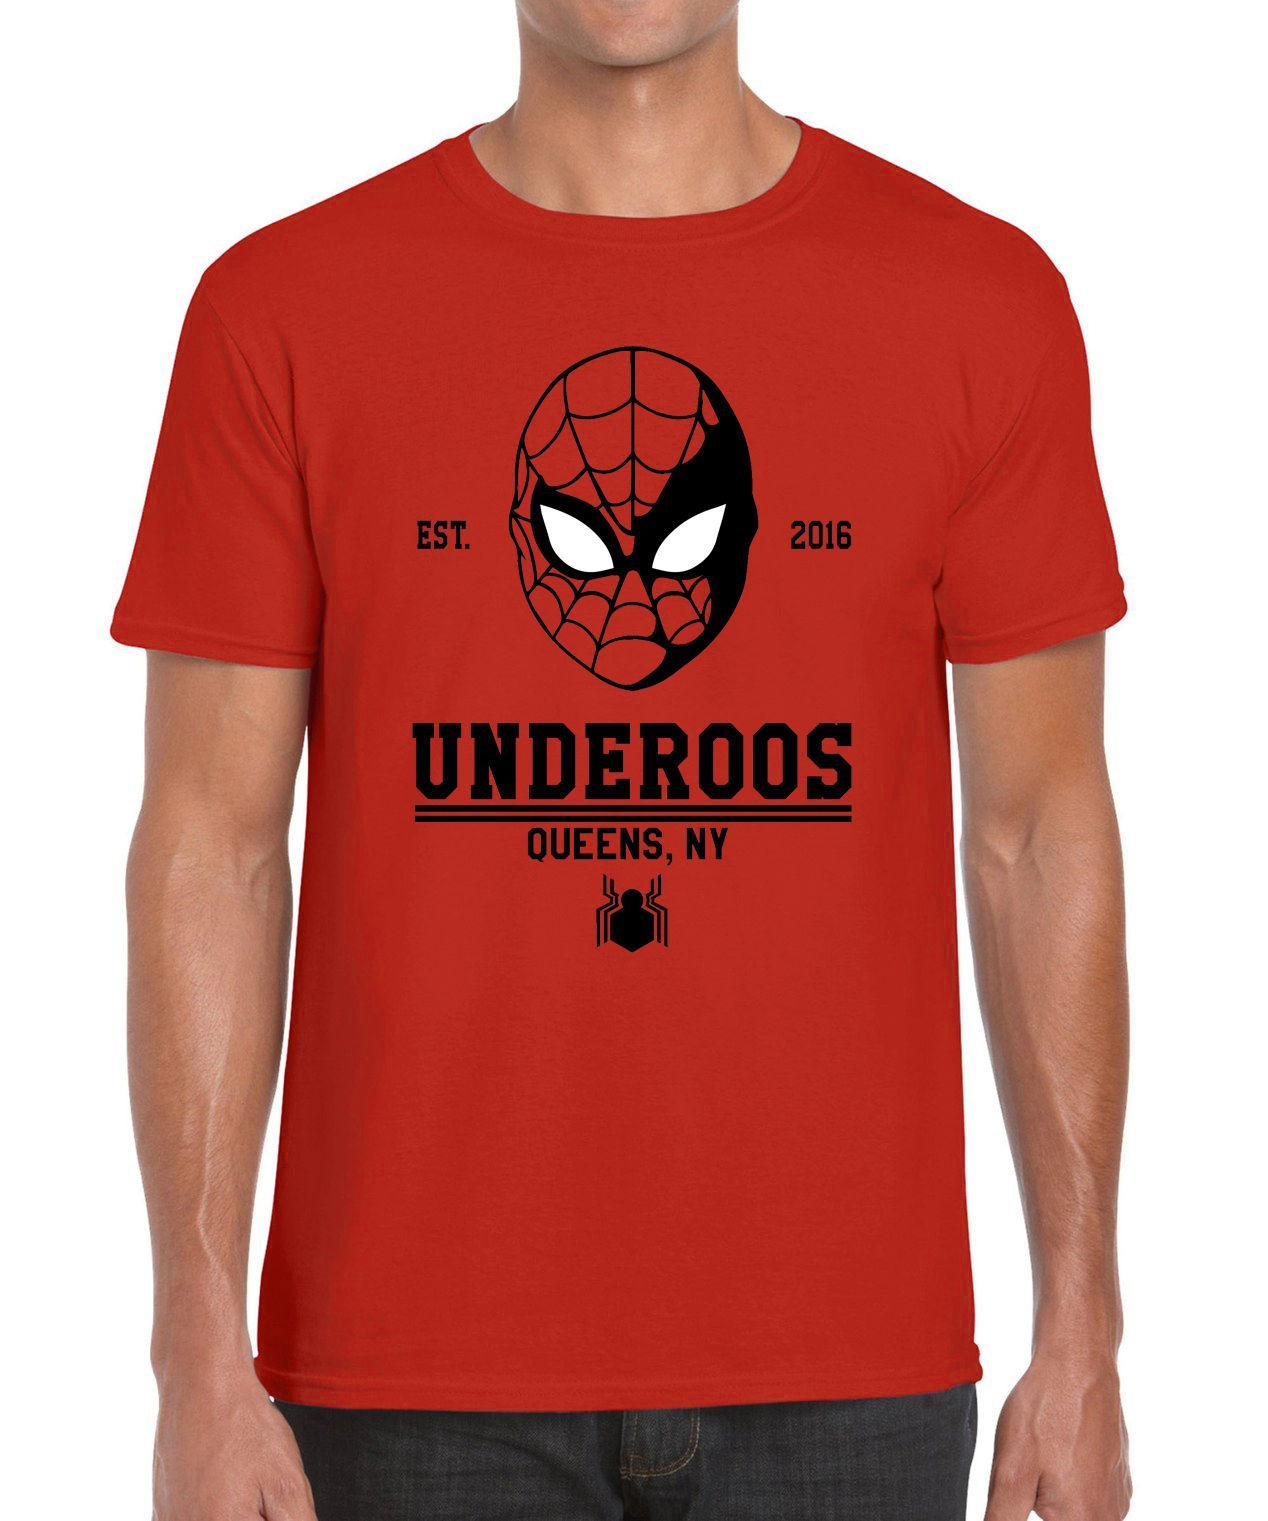 db33fa9f Underoos Spider Man University Marvel Civil War Parody Inspired Graphic T  Shirt Irish T Shirts Art T Shirts From Funnytees, $15.72| DHgate.Com